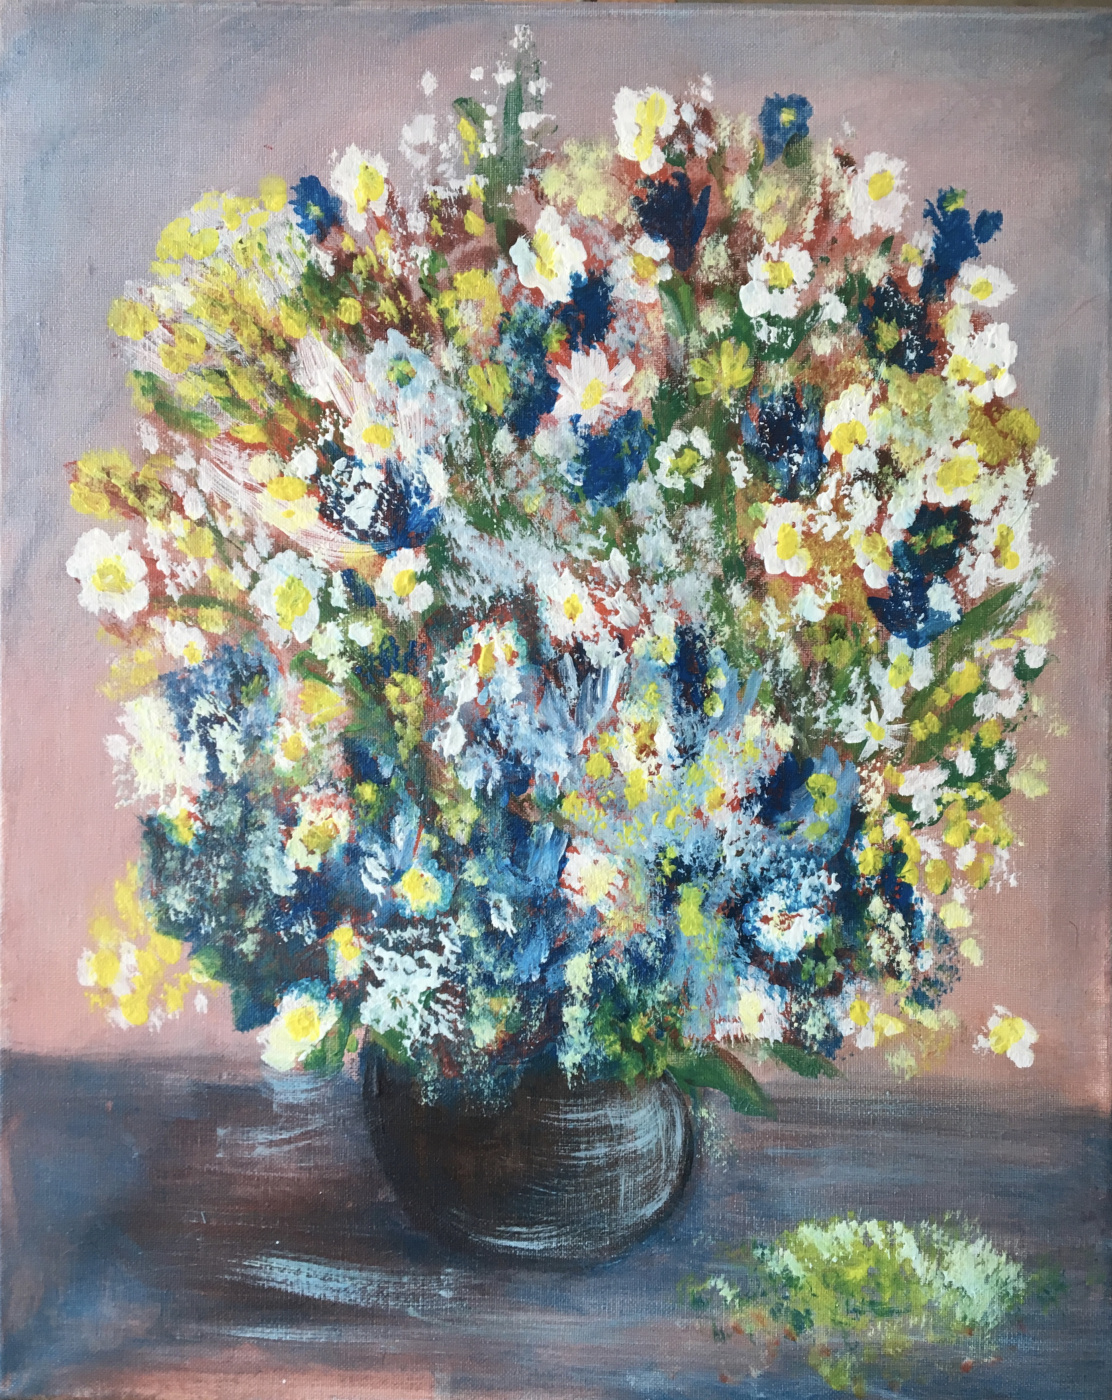 Mihails (Mikhail) Valentinovich Ribenko (Rybenko). Flower mood